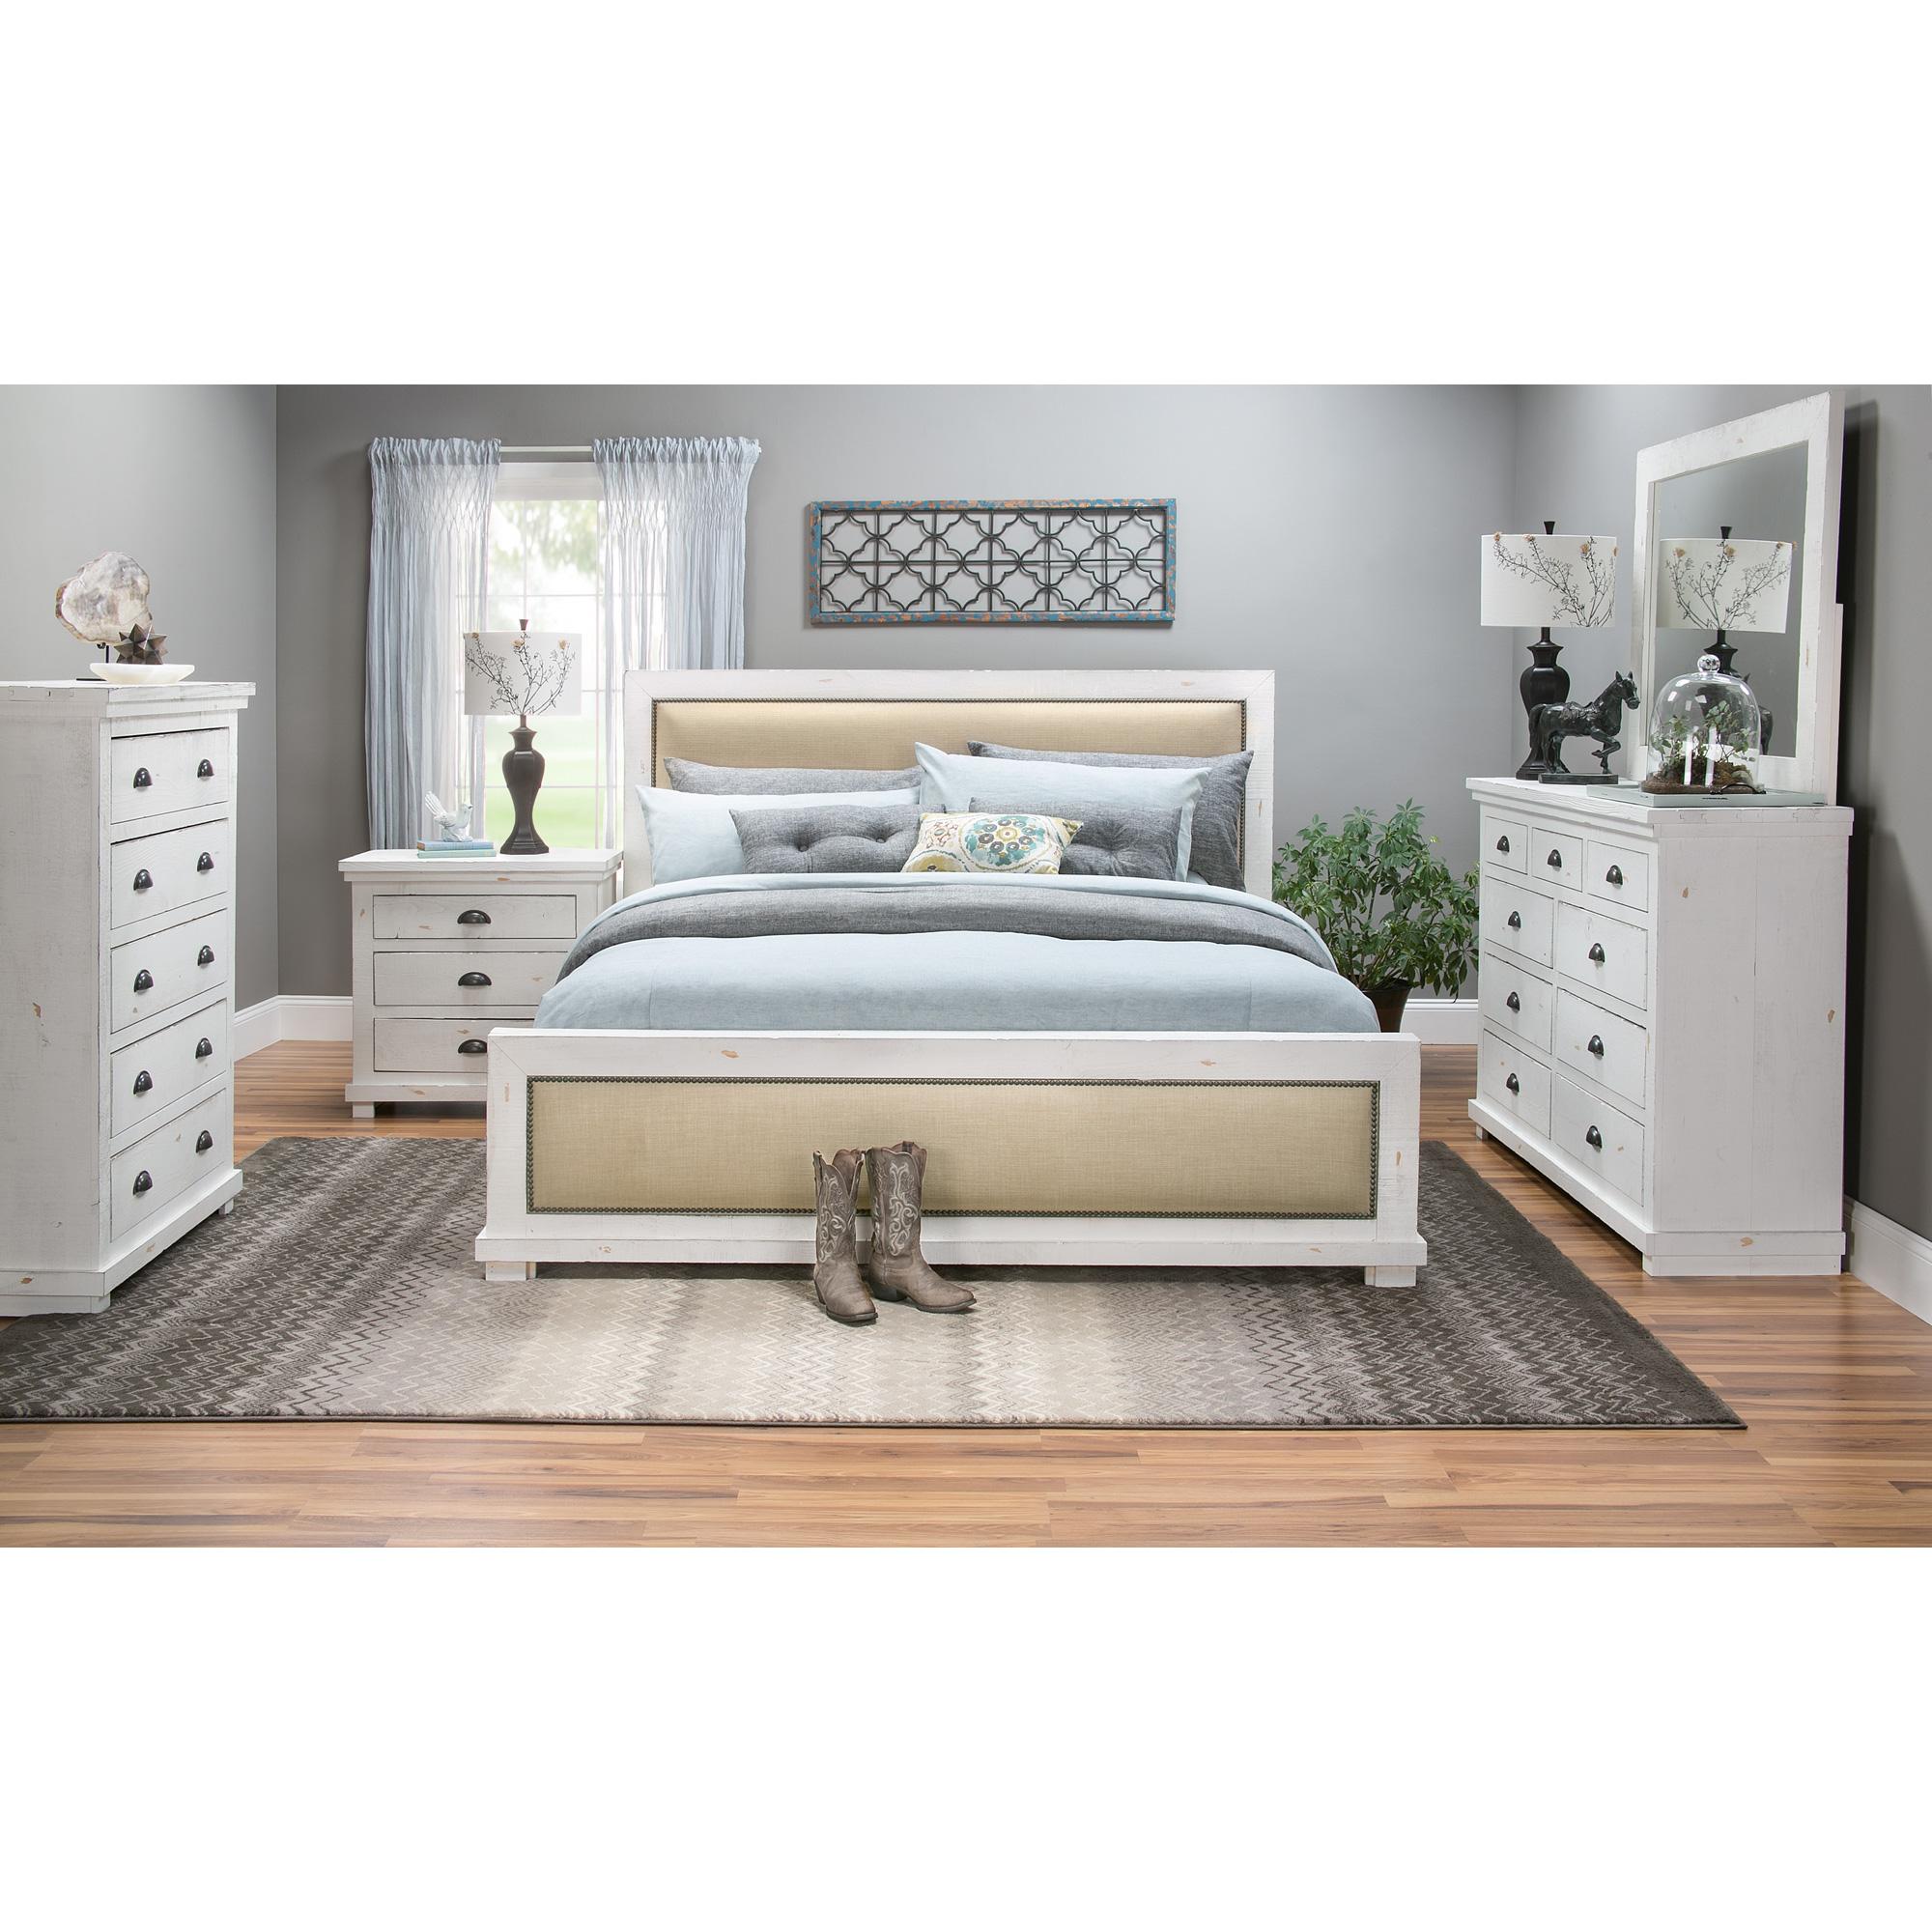 Progressive Furniture Willow Distressed White King Upholstered 4 Piece Room Group Bedroom Set From Slumberland Furniture Ibt Shop